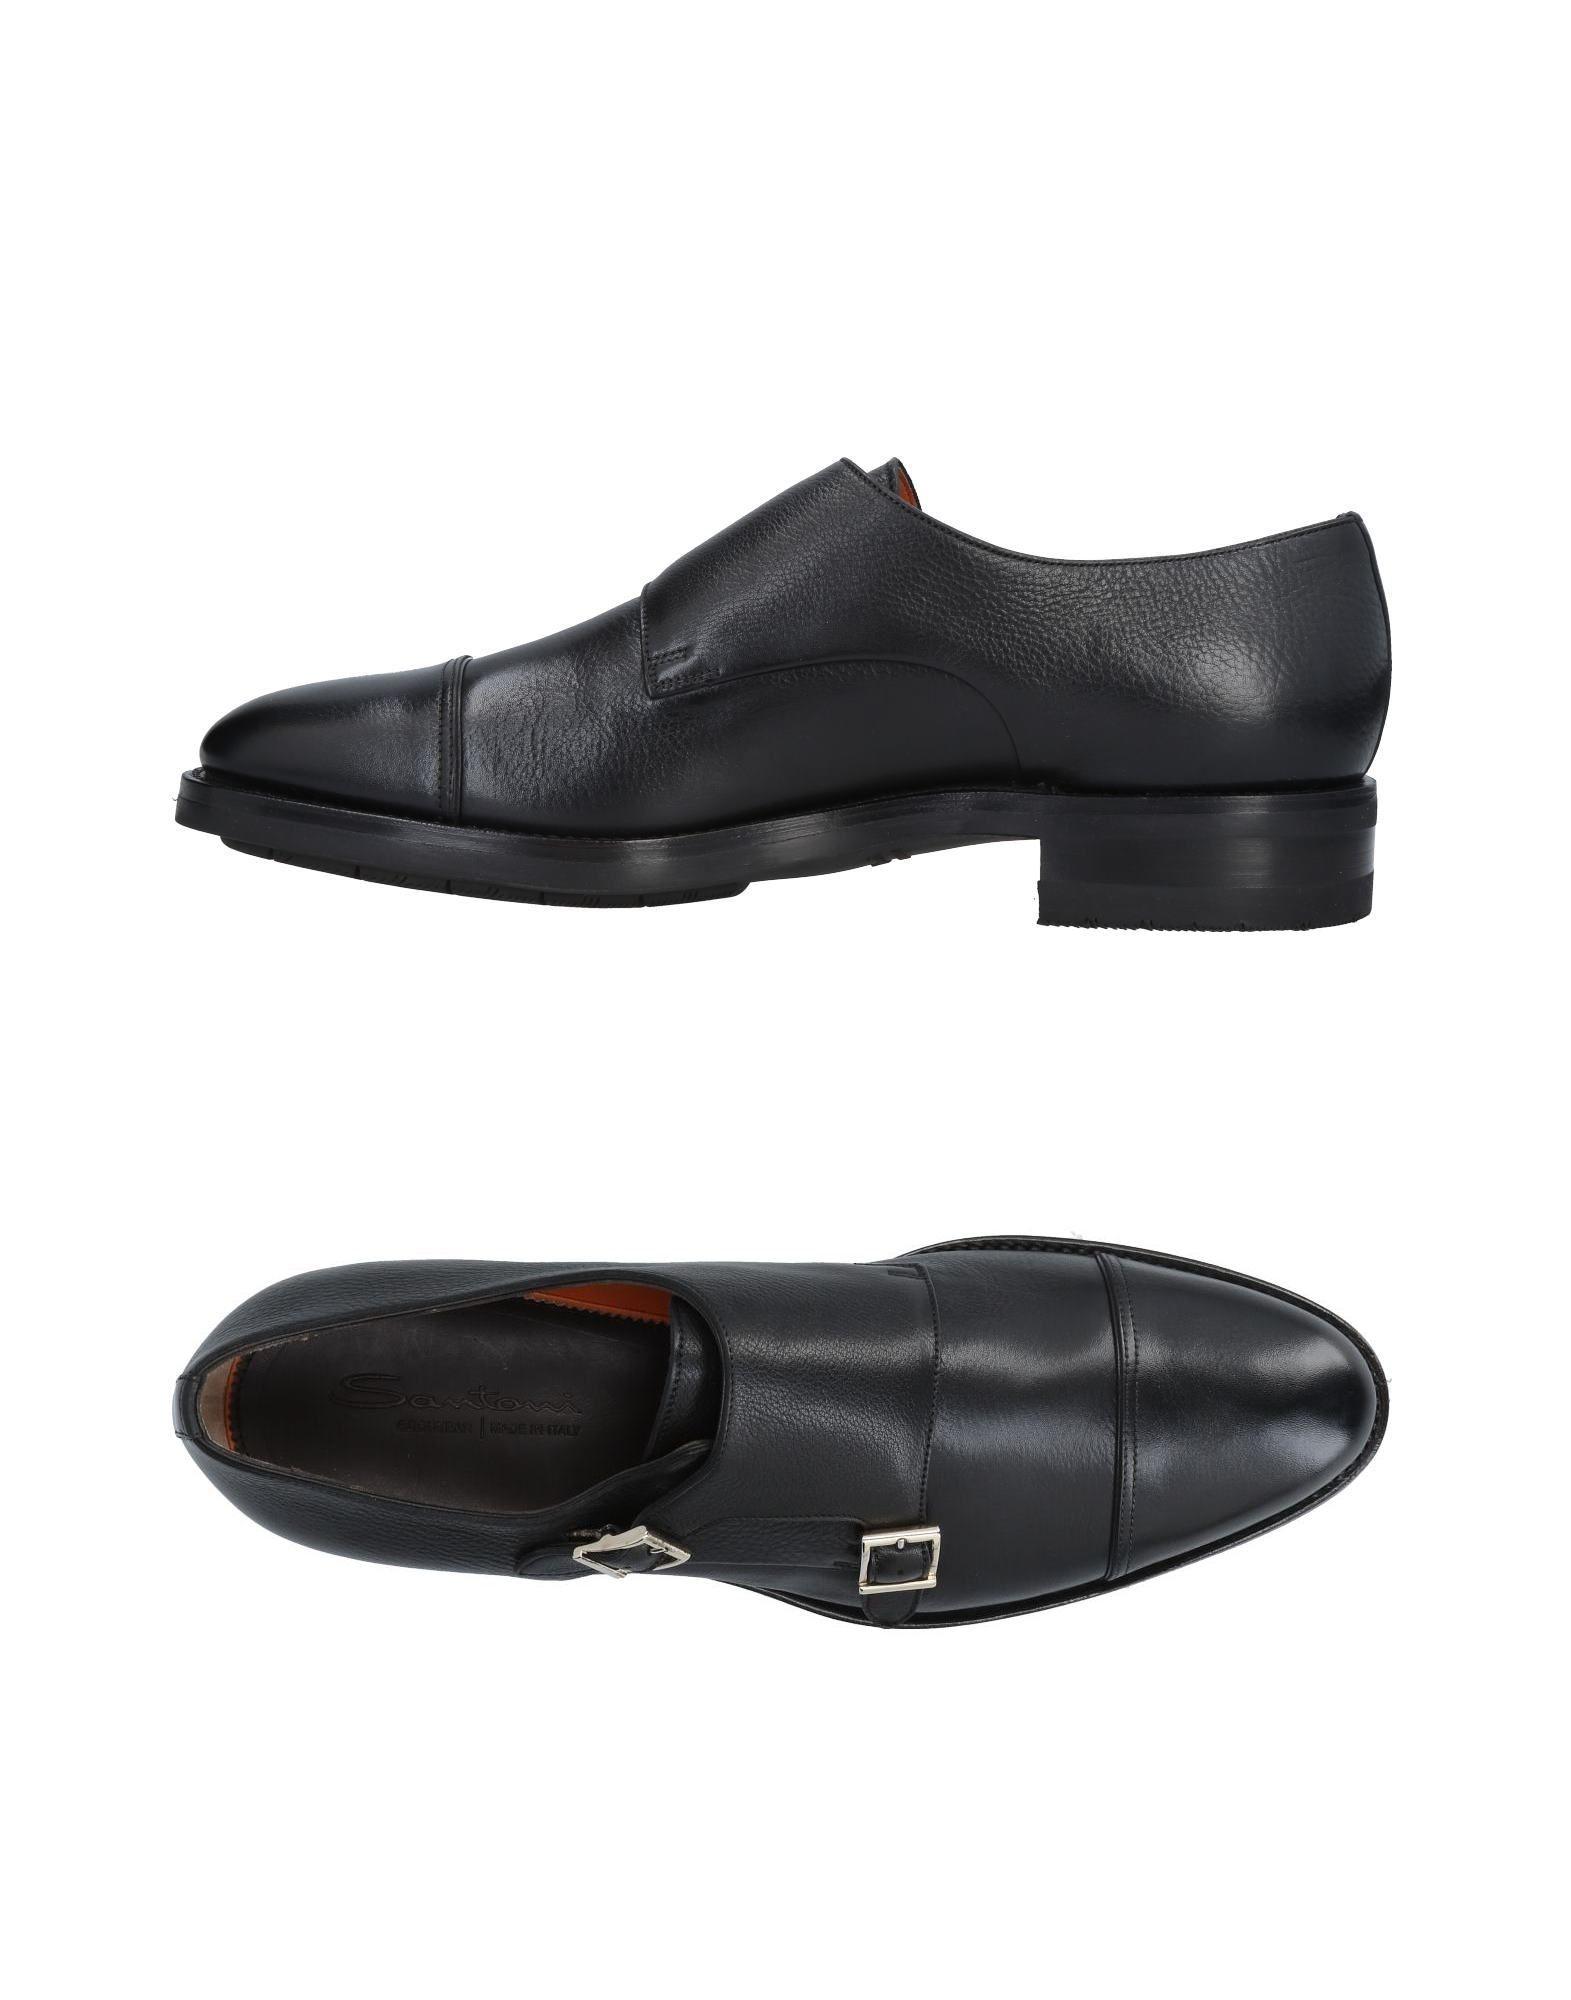 Santoni Mokassins Qualität Herren  11478588SU Gute Qualität Mokassins beliebte Schuhe 100b6f